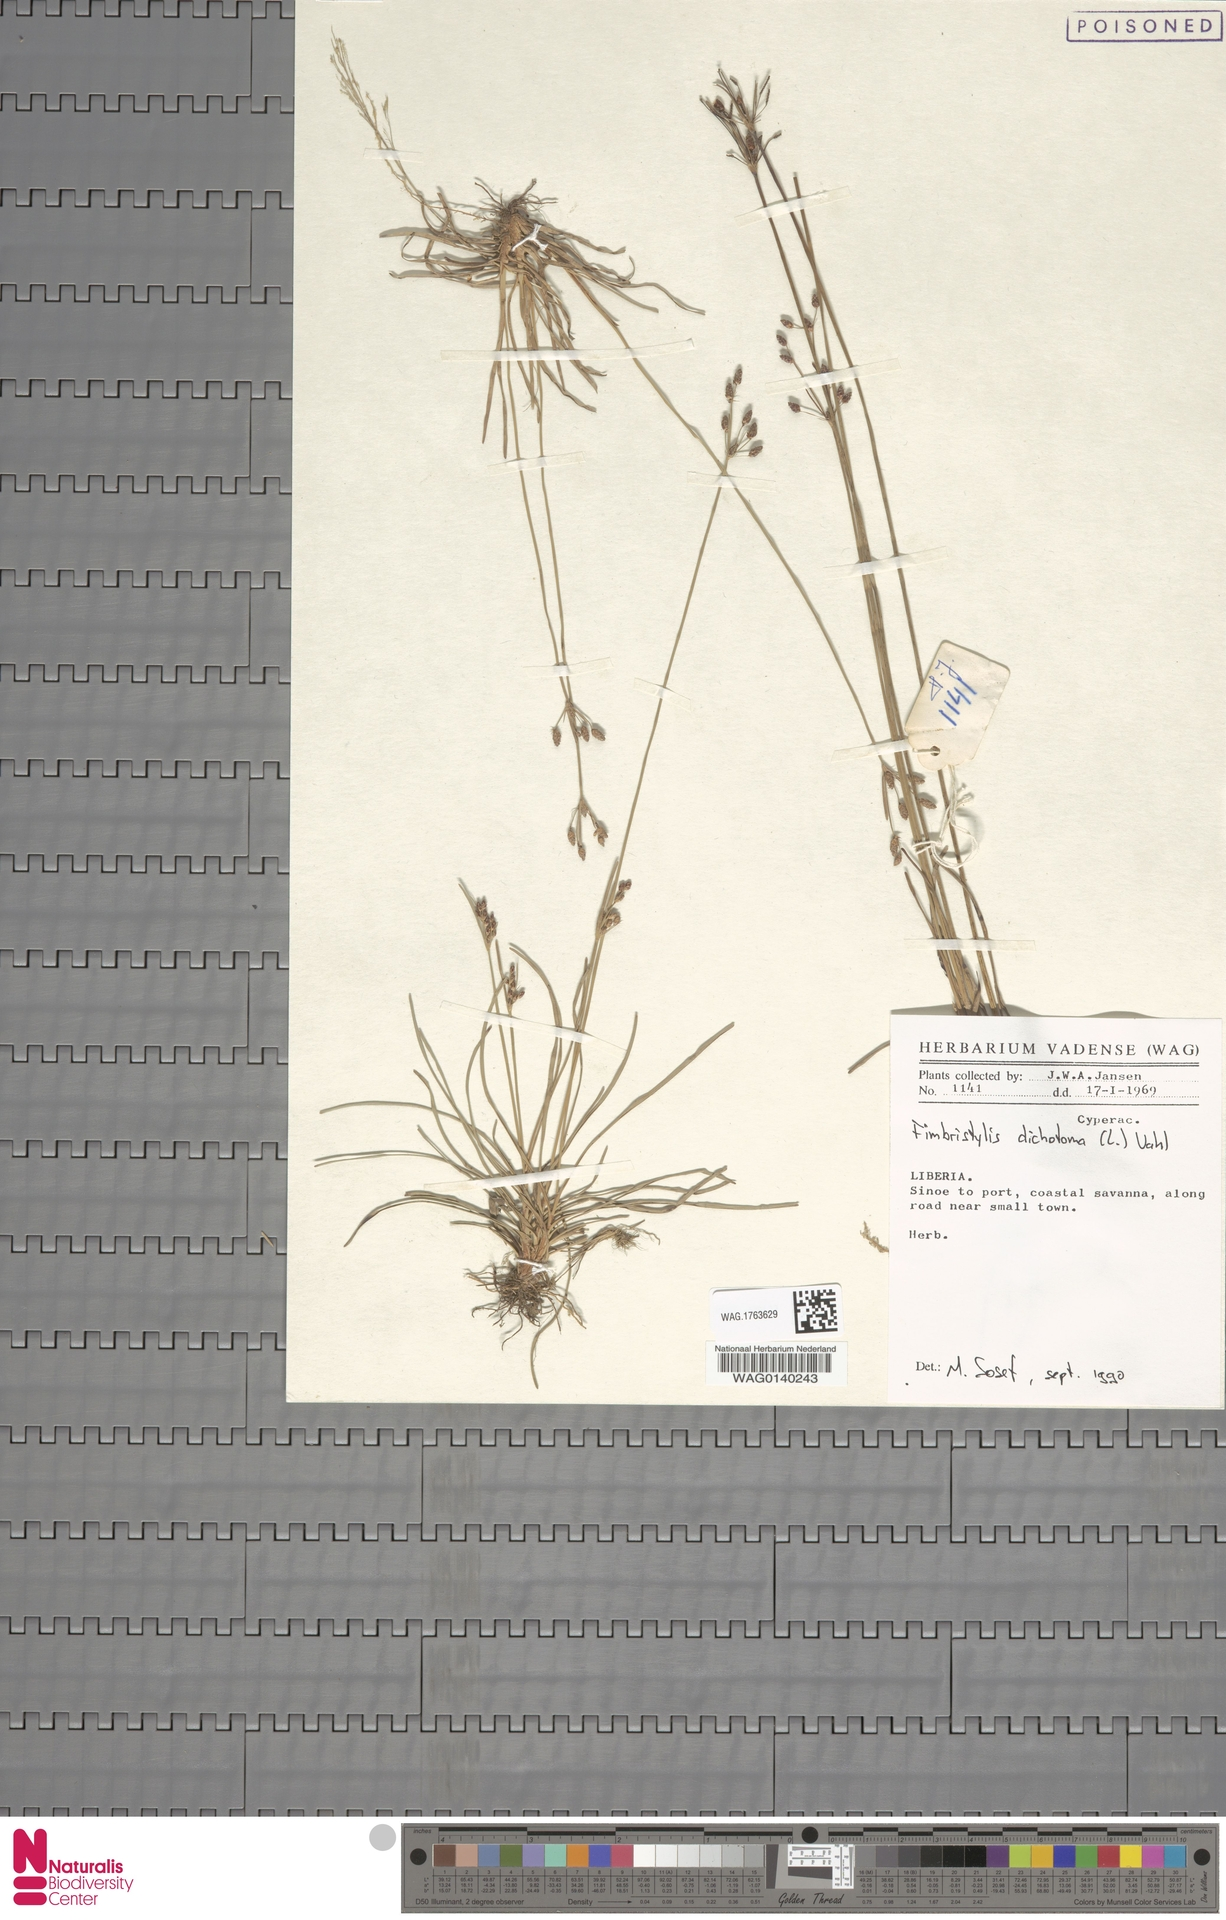 WAG.1763629 | Fimbristylis dichotoma (L.) Vahl